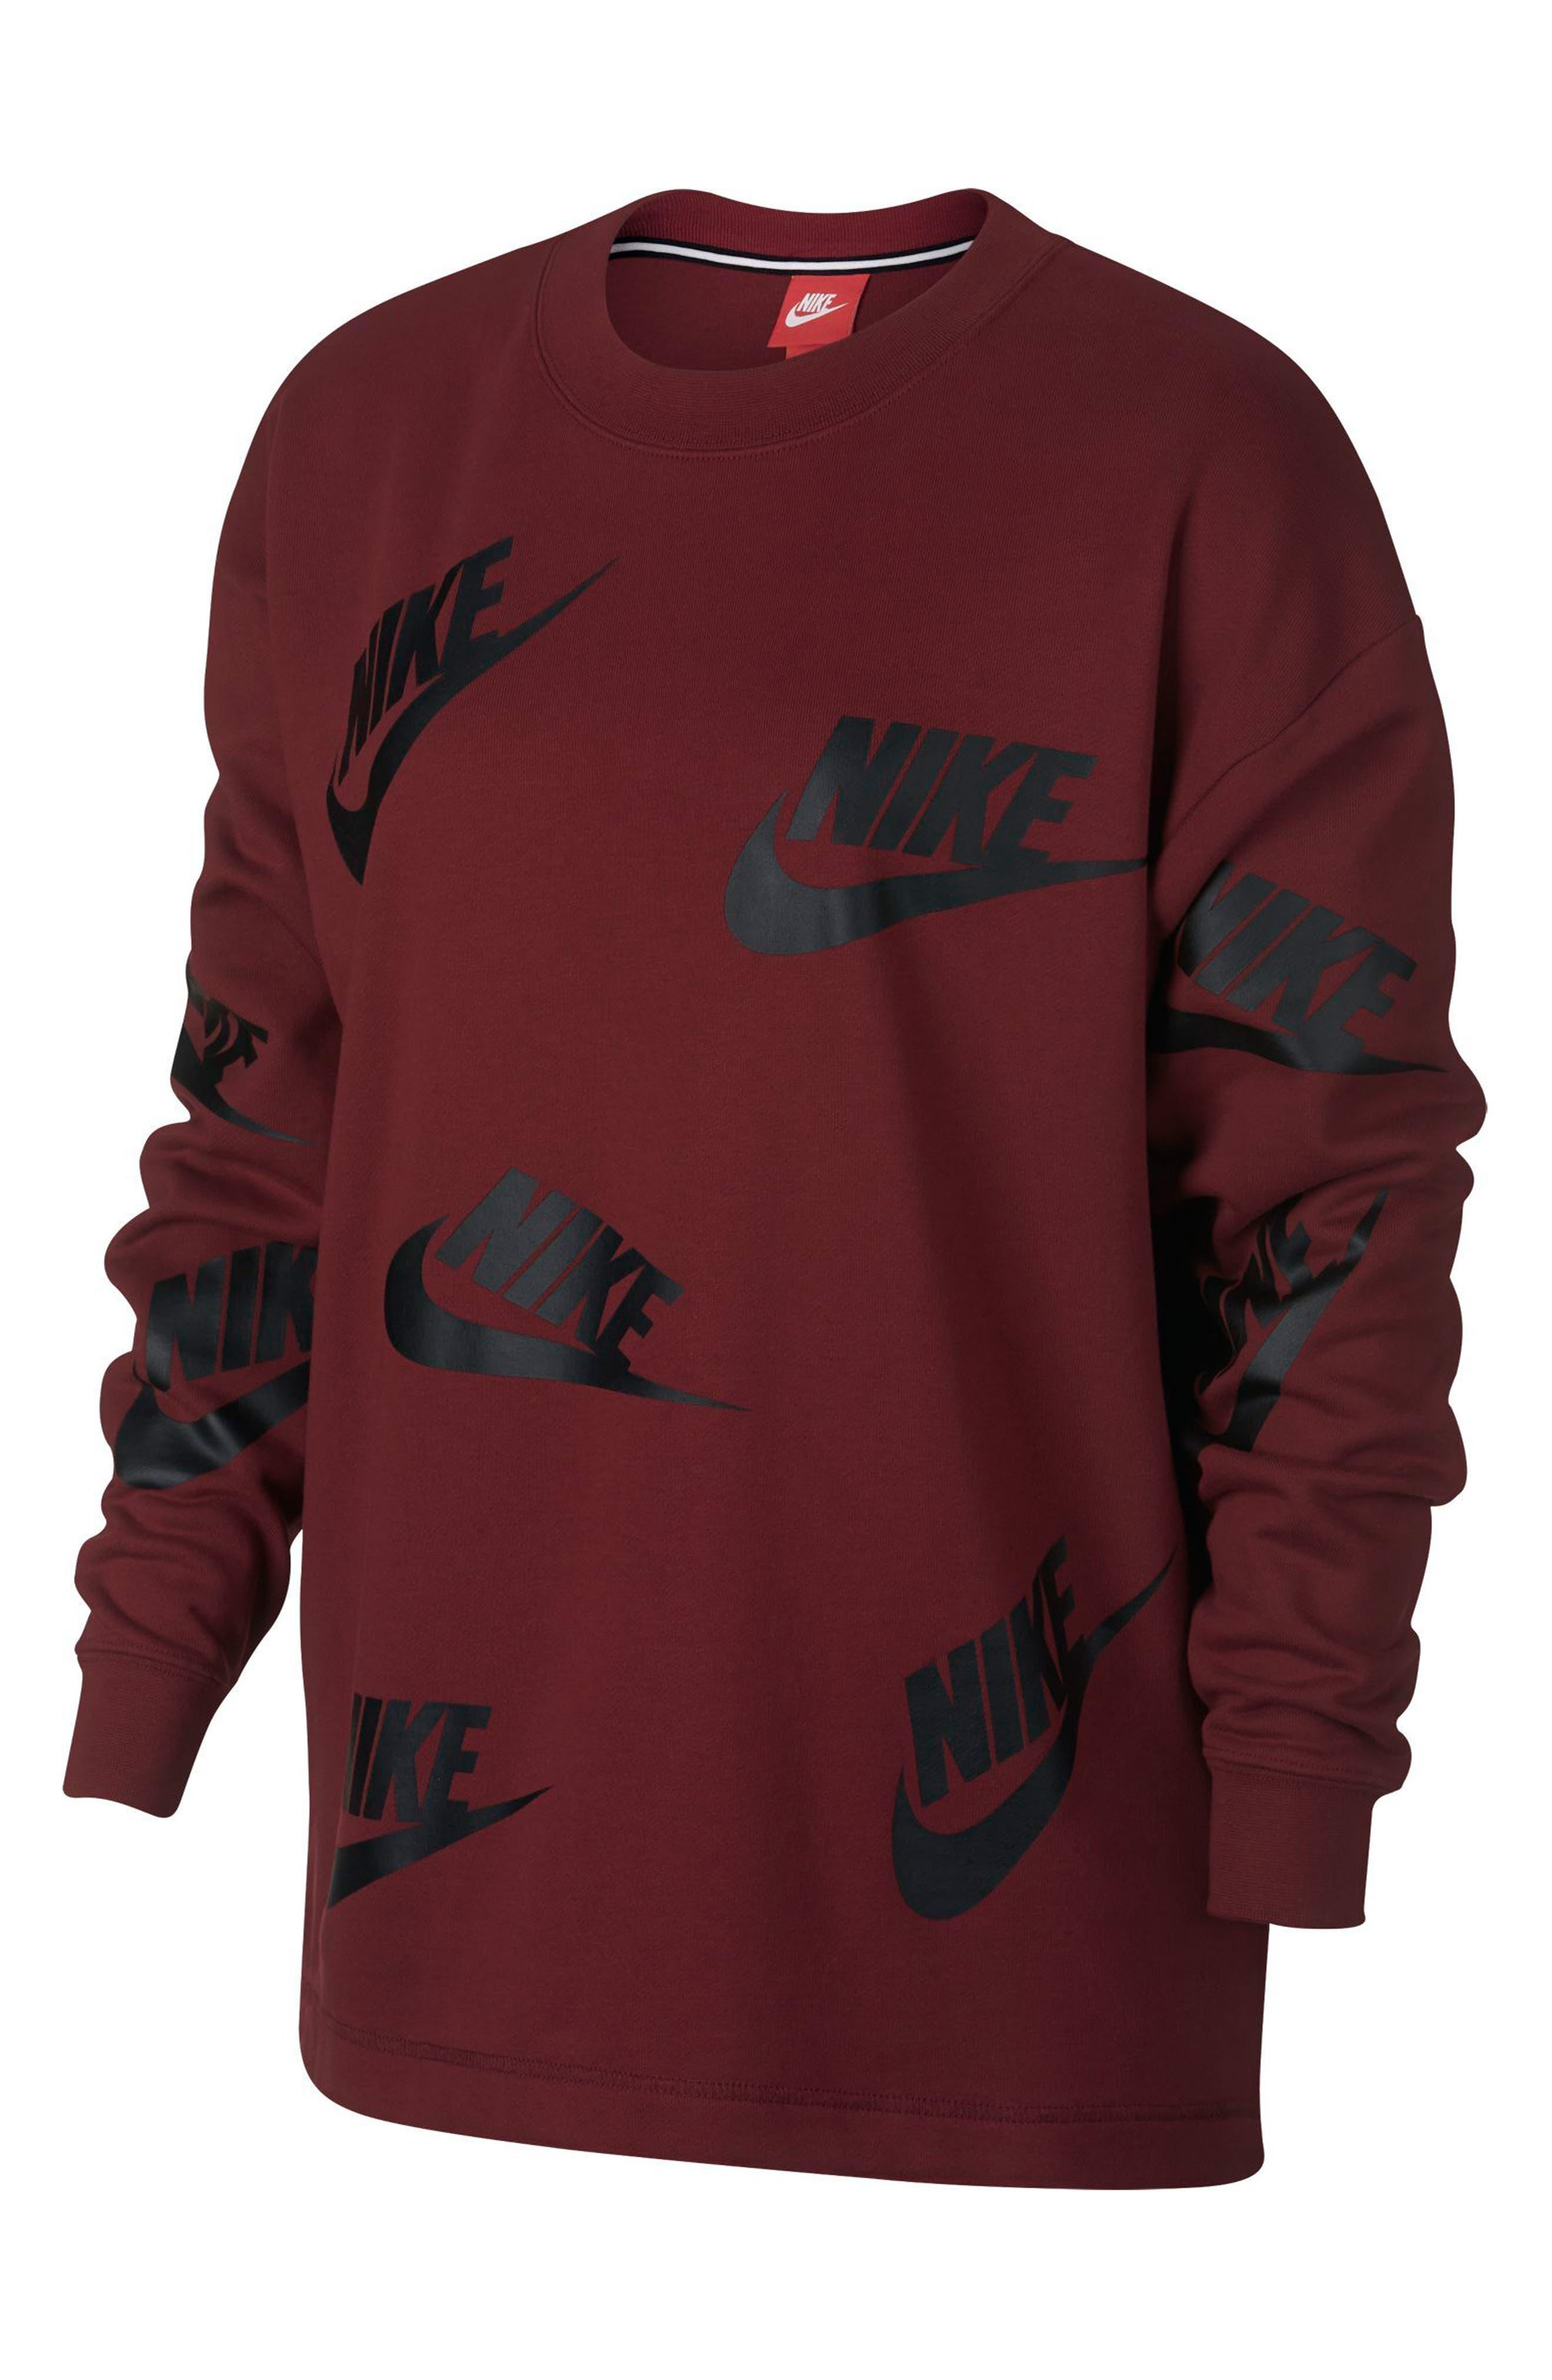 Sportswear Futura Women's Crewneck Sweatshirt,                         Main,                         color, Team Red/ Black